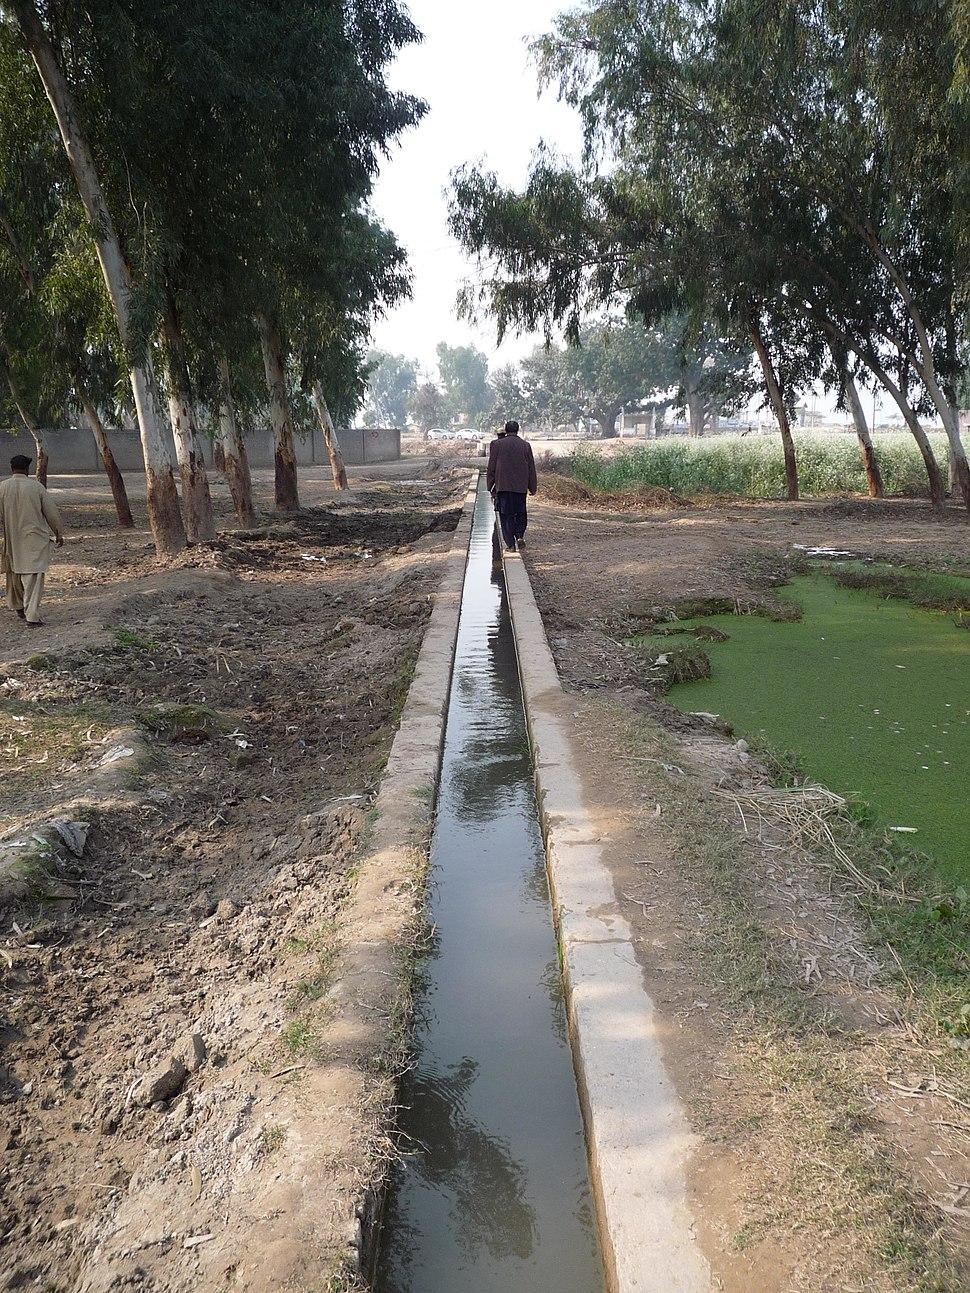 Irrigation Faisalabad, Pakistan (PSSP)